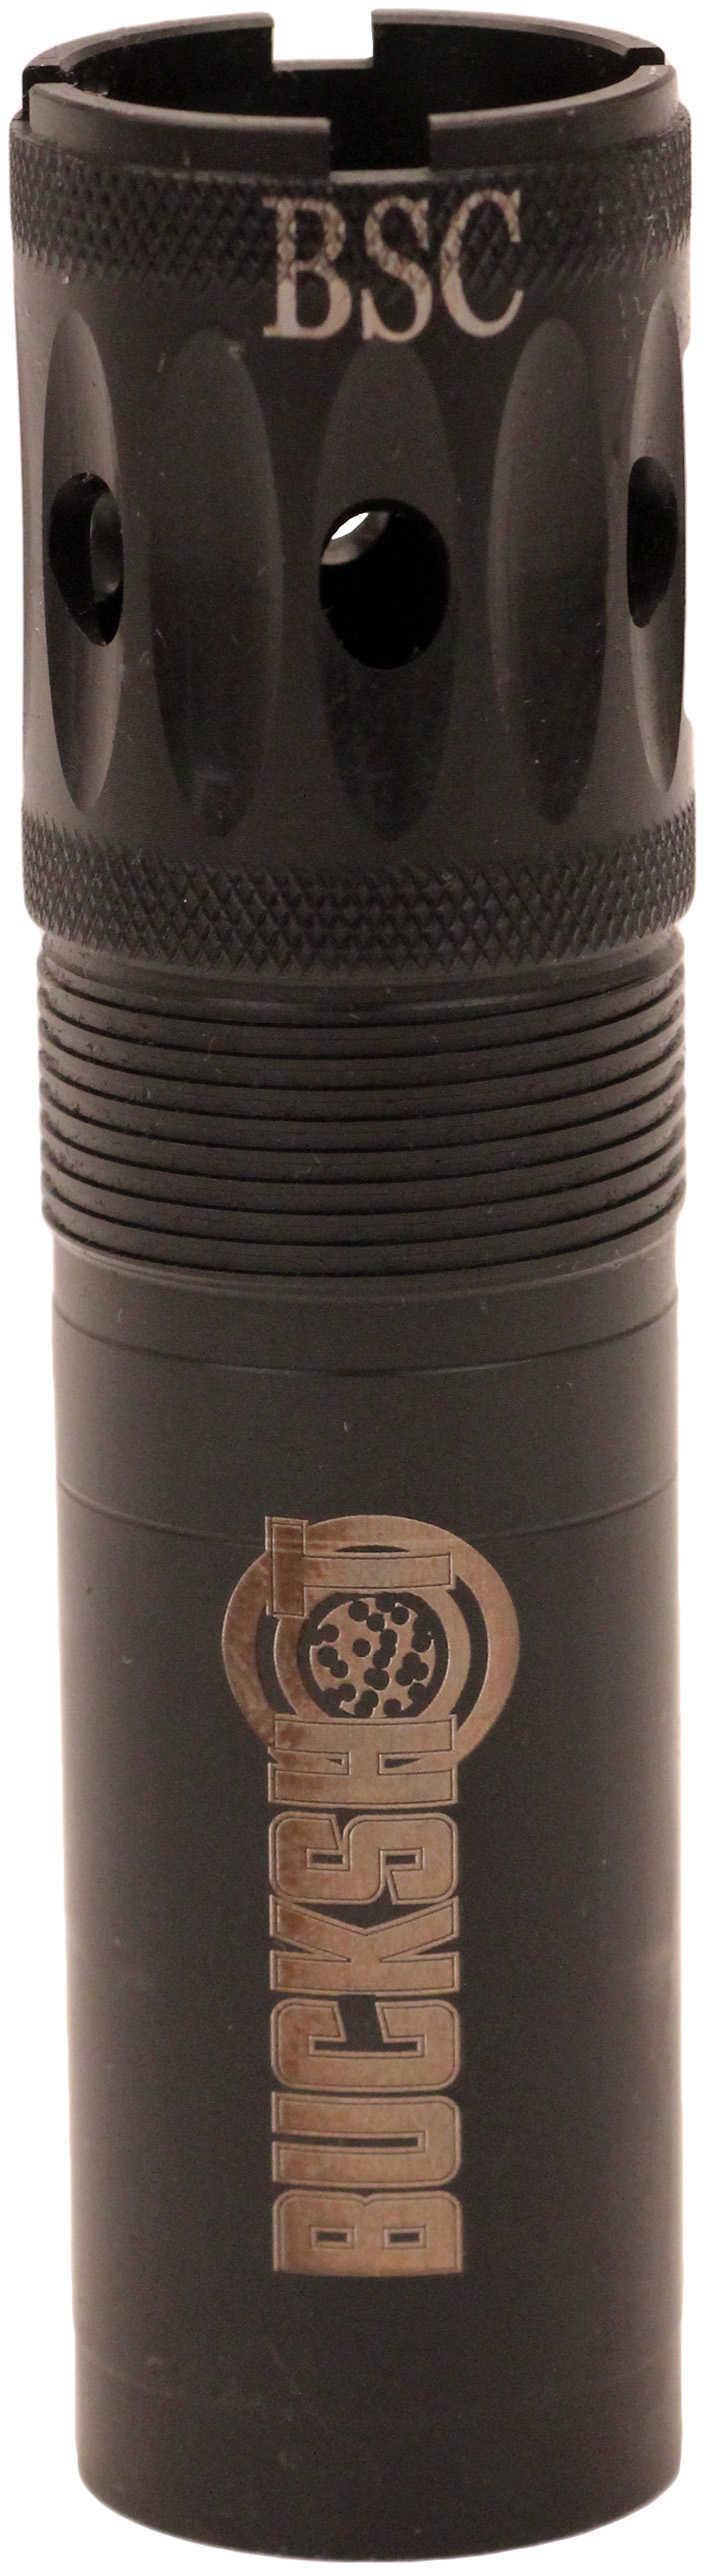 Carlsons 15599 Buckshot Benelli/Beretta 12 Gauge 17-4 Stainless Steel Black Ported